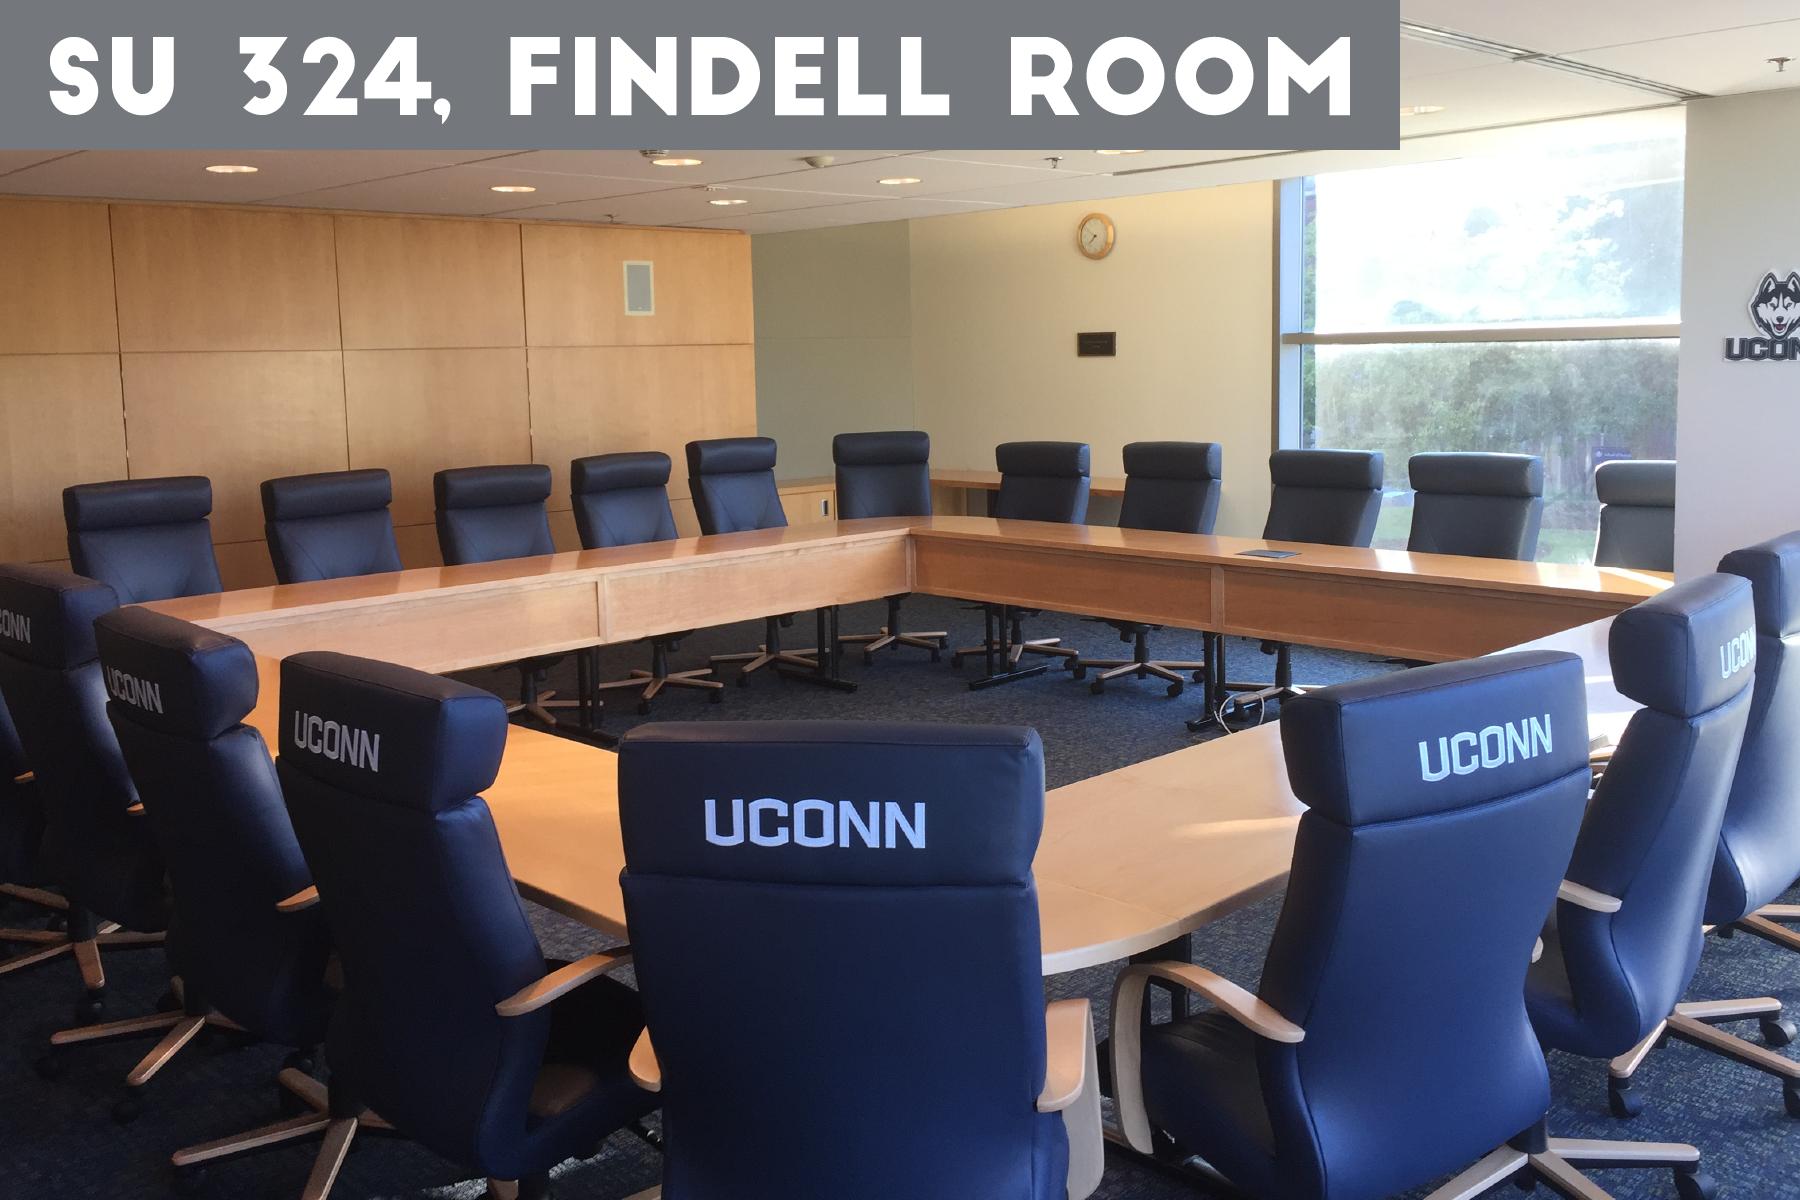 Student Union Room 324